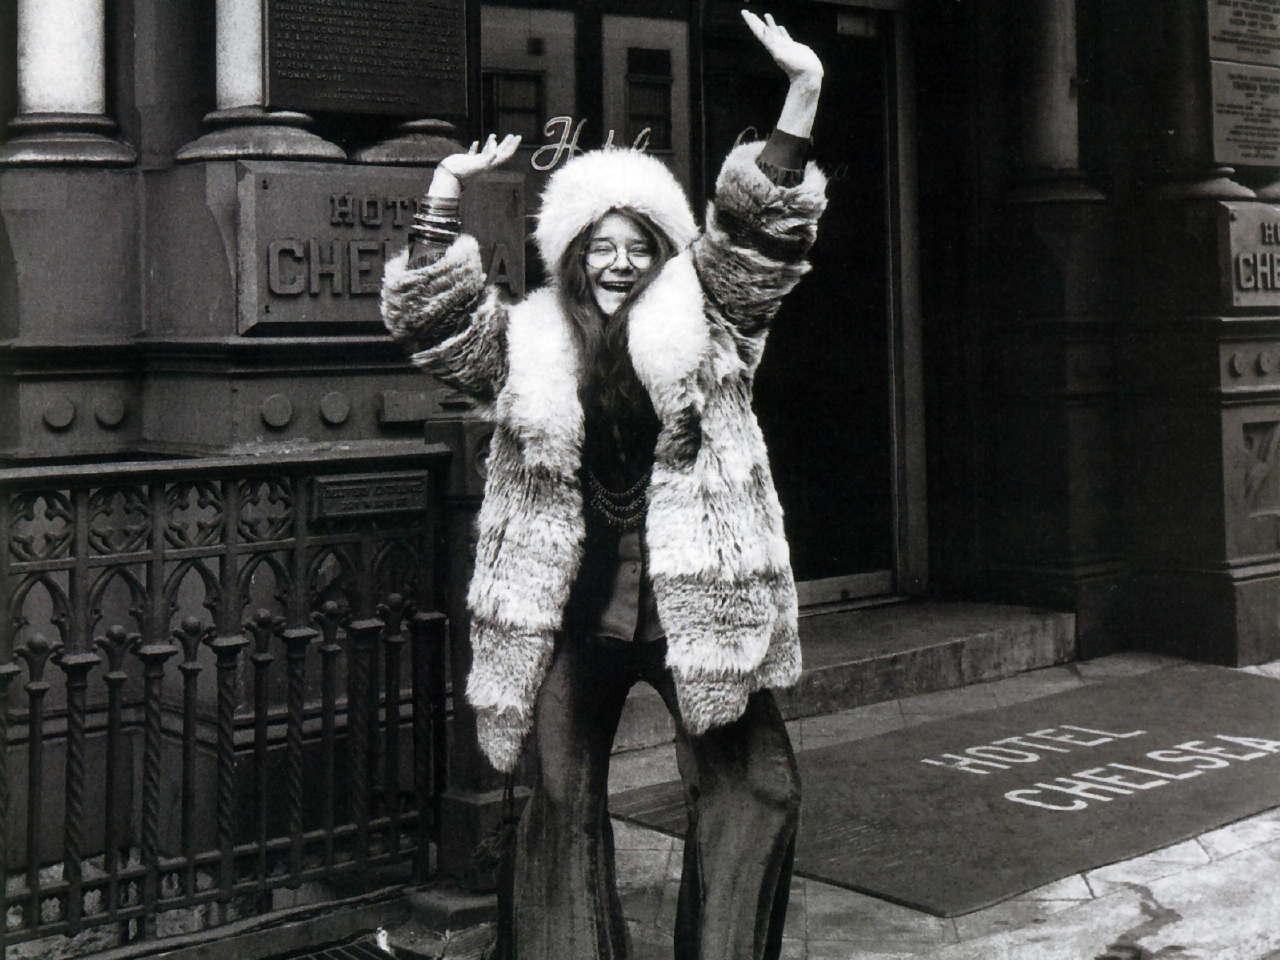 Janis Joplin by David Gahr